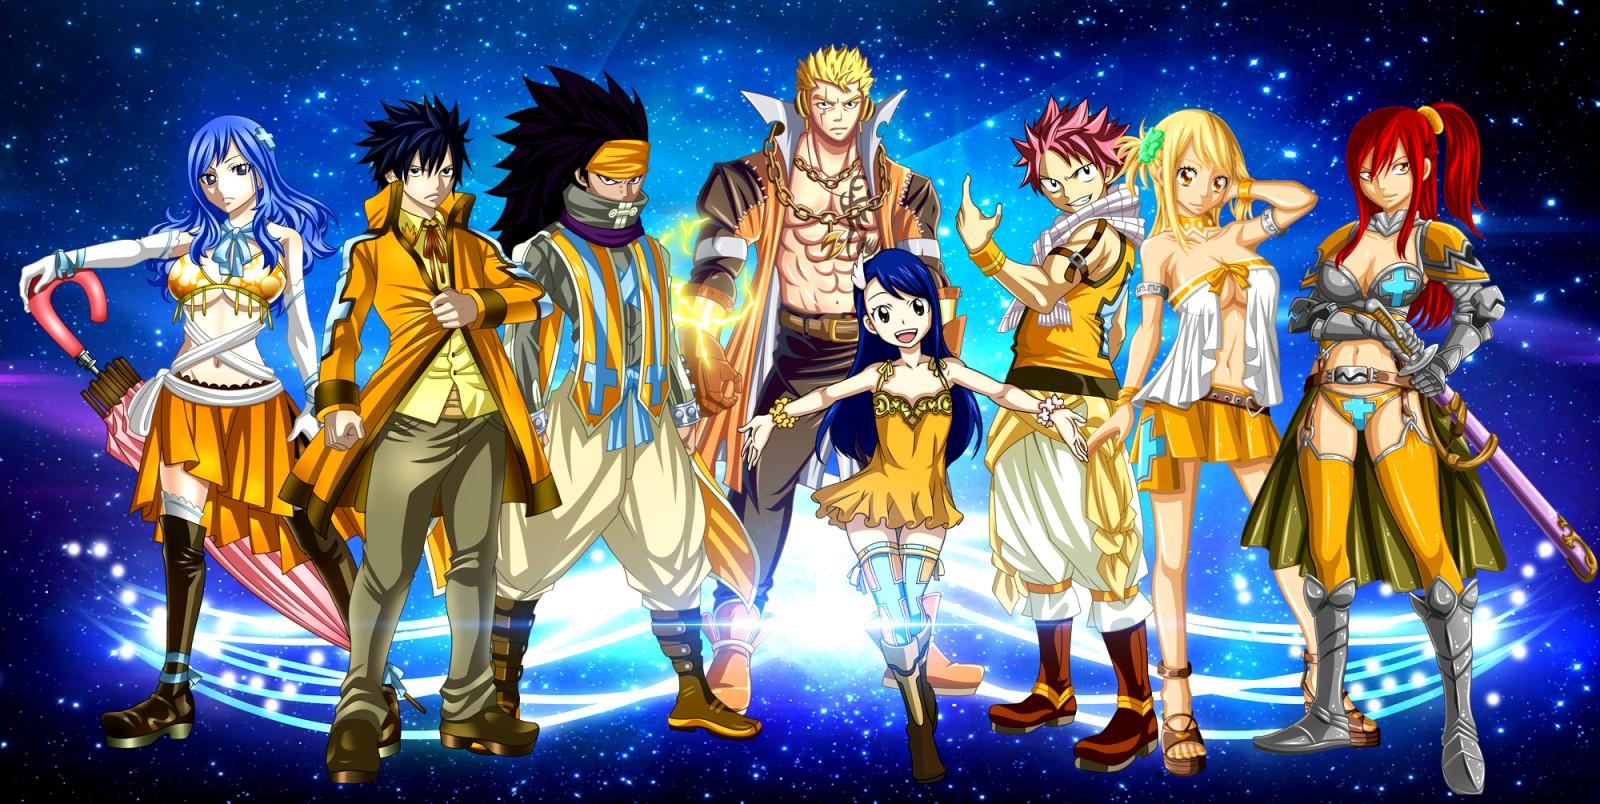 Download Fairy Tail Fantasia Hd Wallpaper Full HD Wallpapers 1600x804